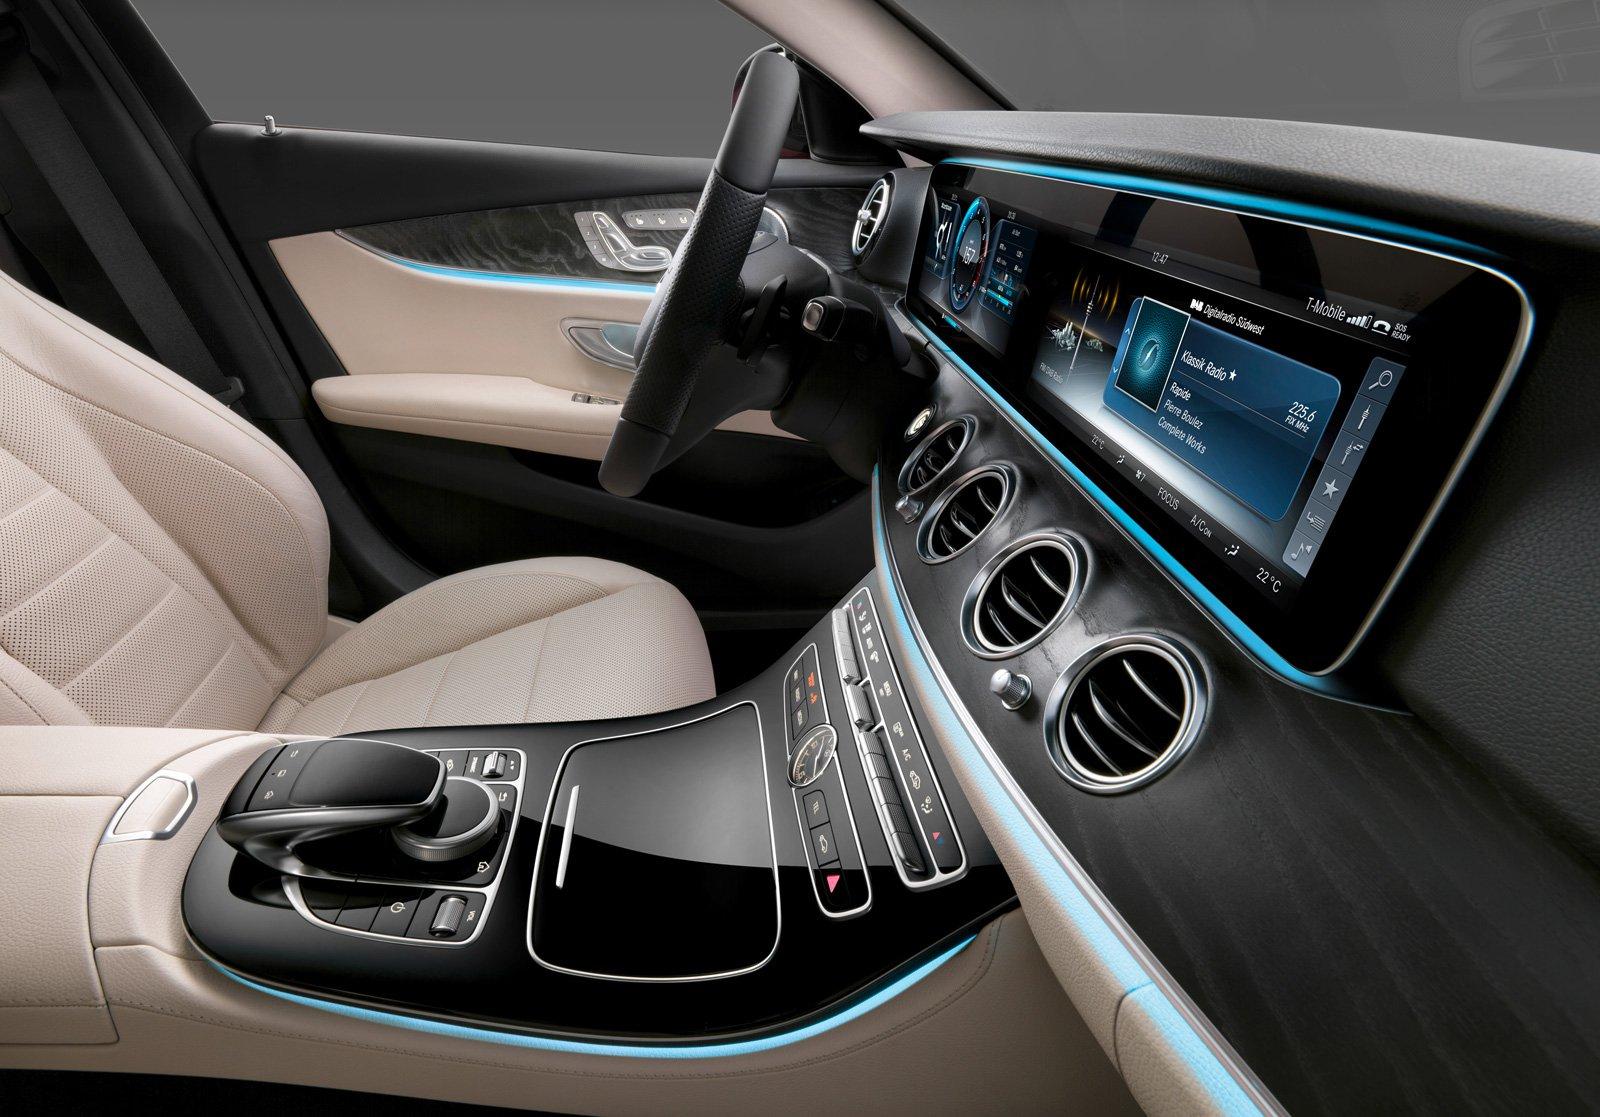 2017 Mercedes E-Class Cockpit Looks Like a Video Game - VR World | {Auto cockpit mercedes 7}